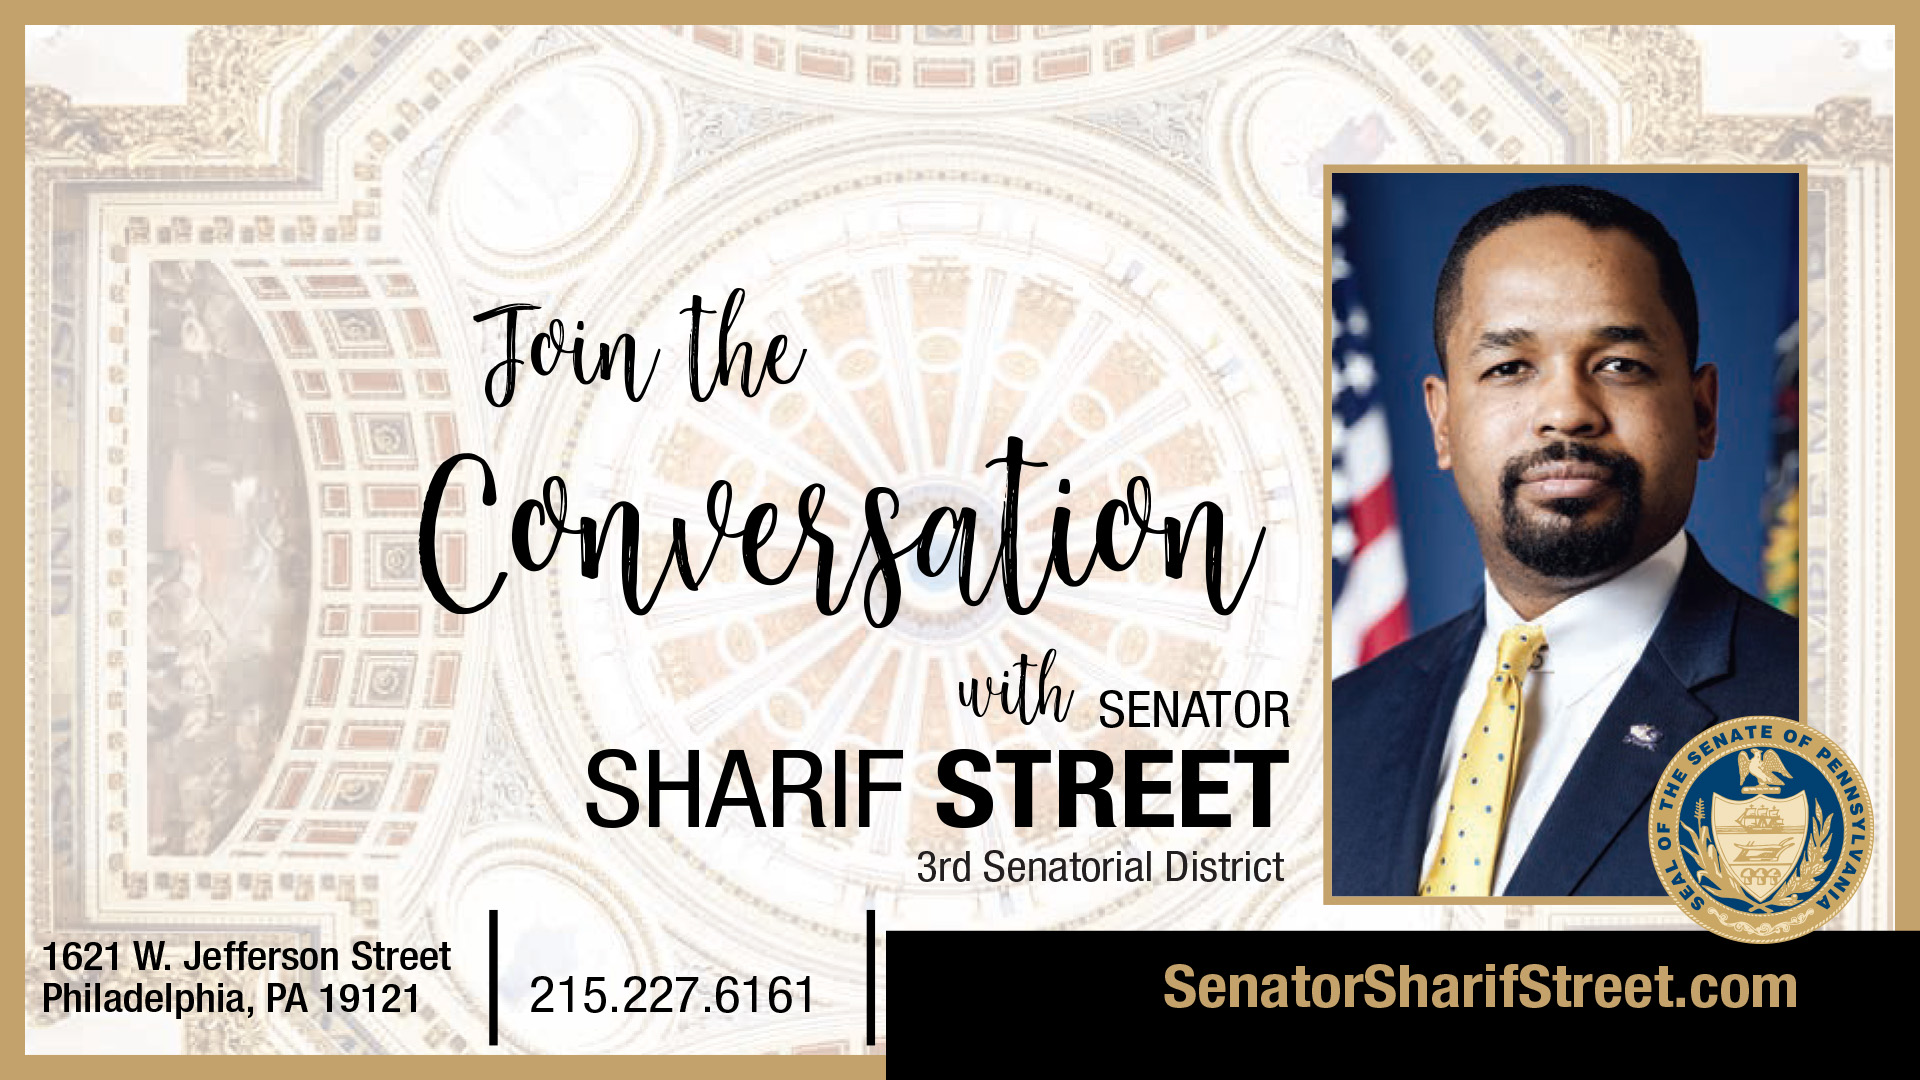 PA State Senator Sharif Street